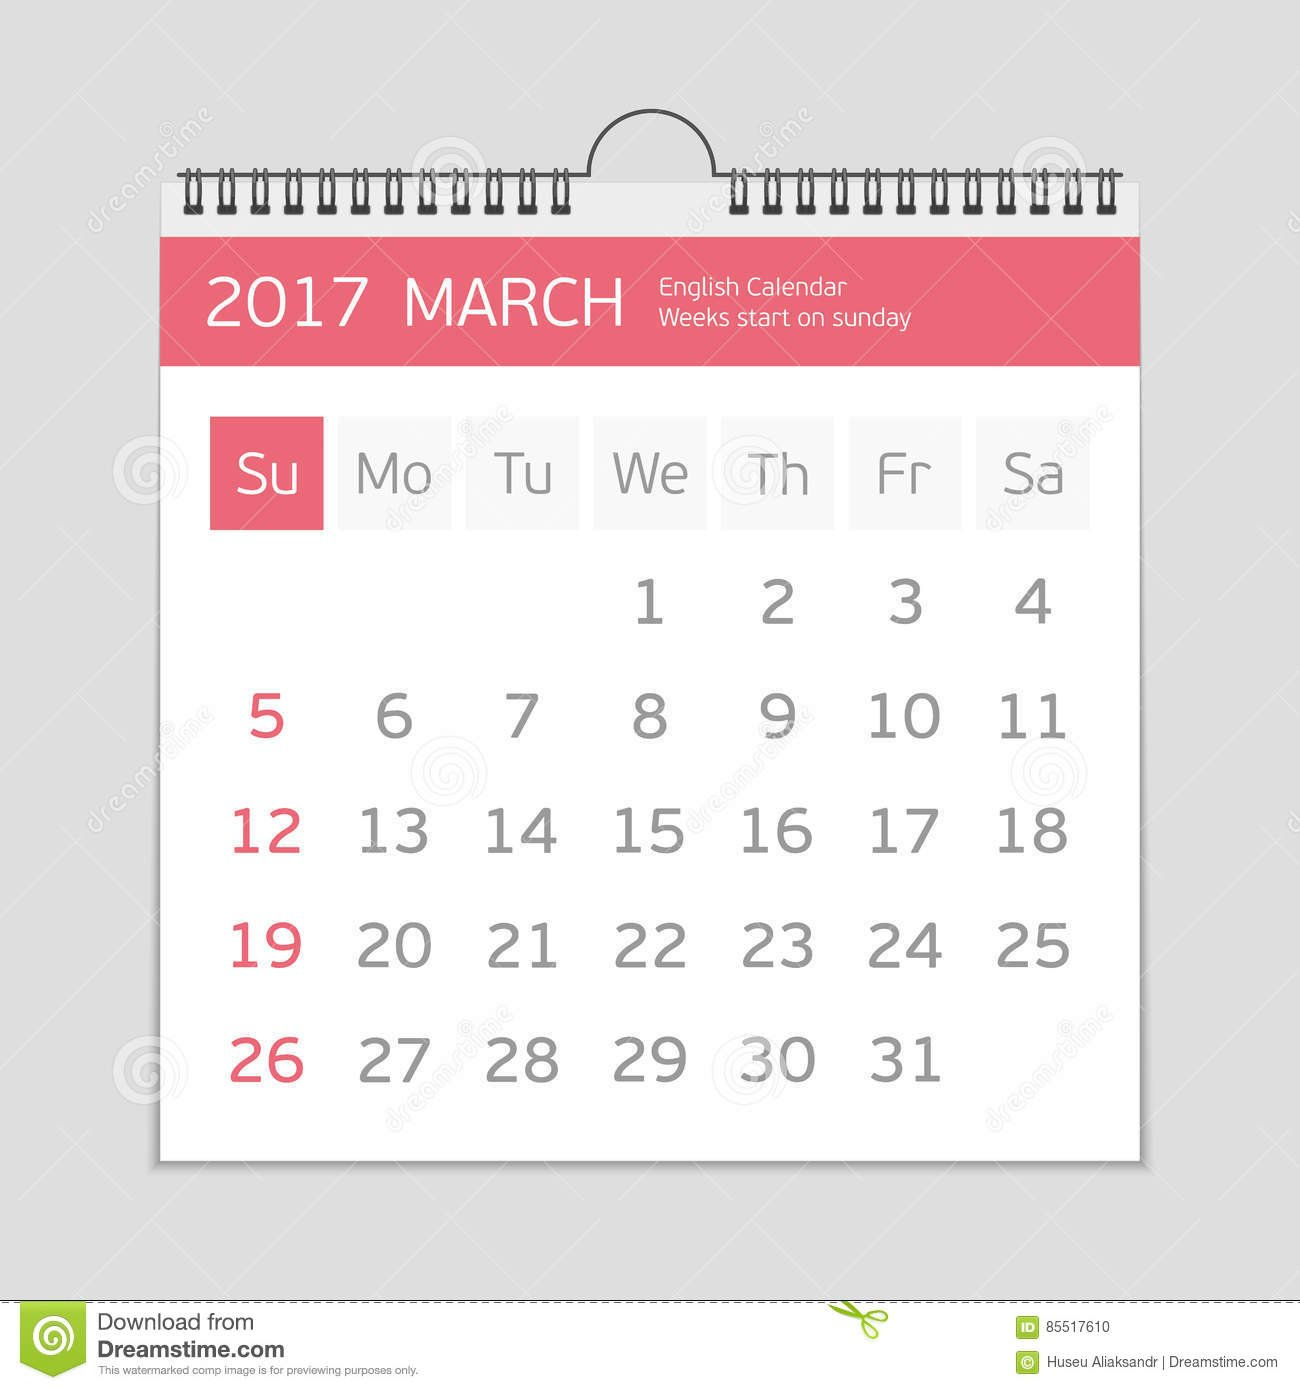 2017 March Calendar Template. Stock Vector – Illustration Of March Last 2 Weeks Calendar